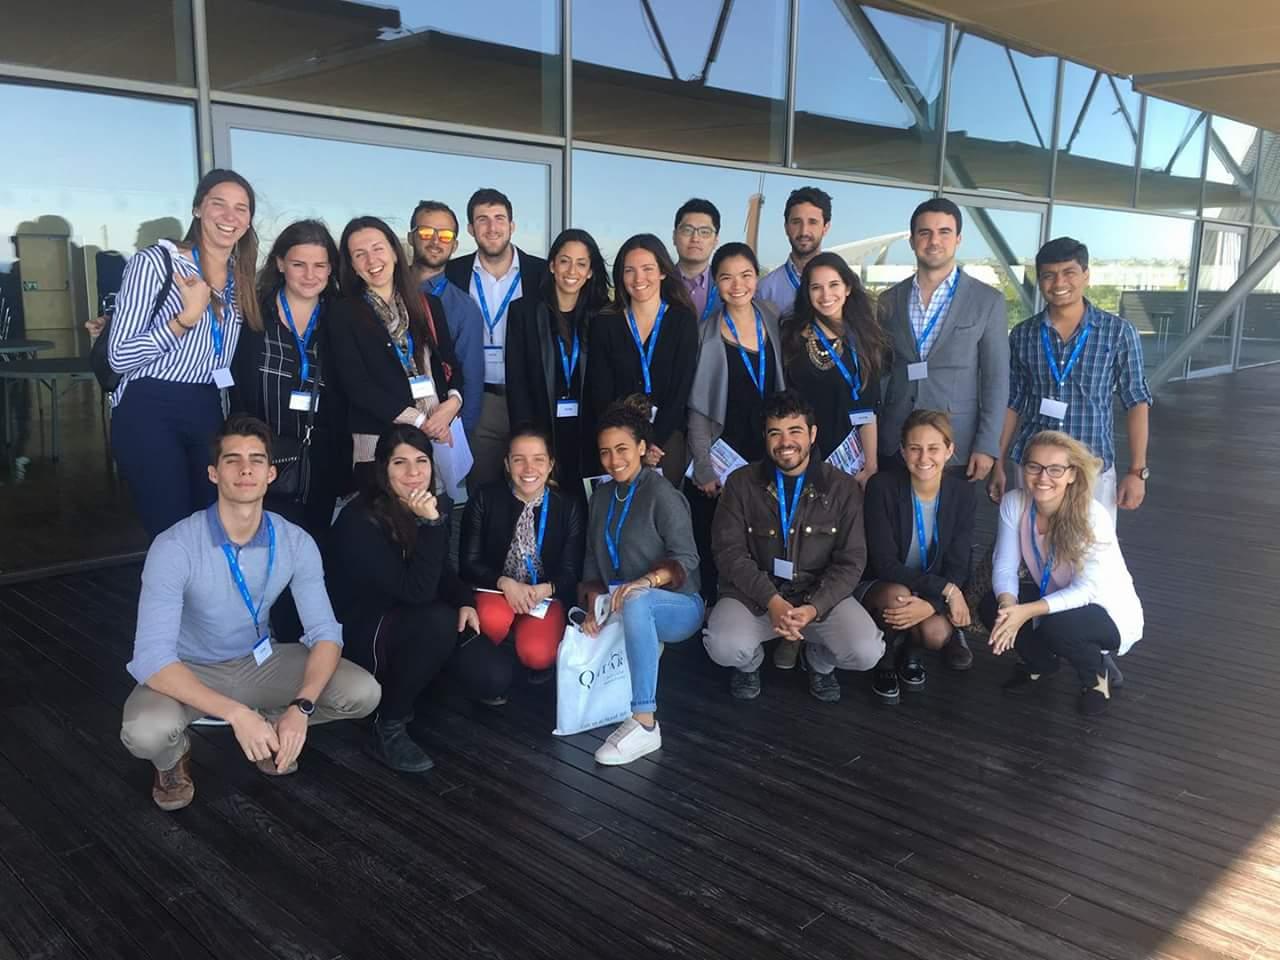 Clase 2017 del programa International Master in Tourism & Hospitality Management visitando CCIB Barcelona.